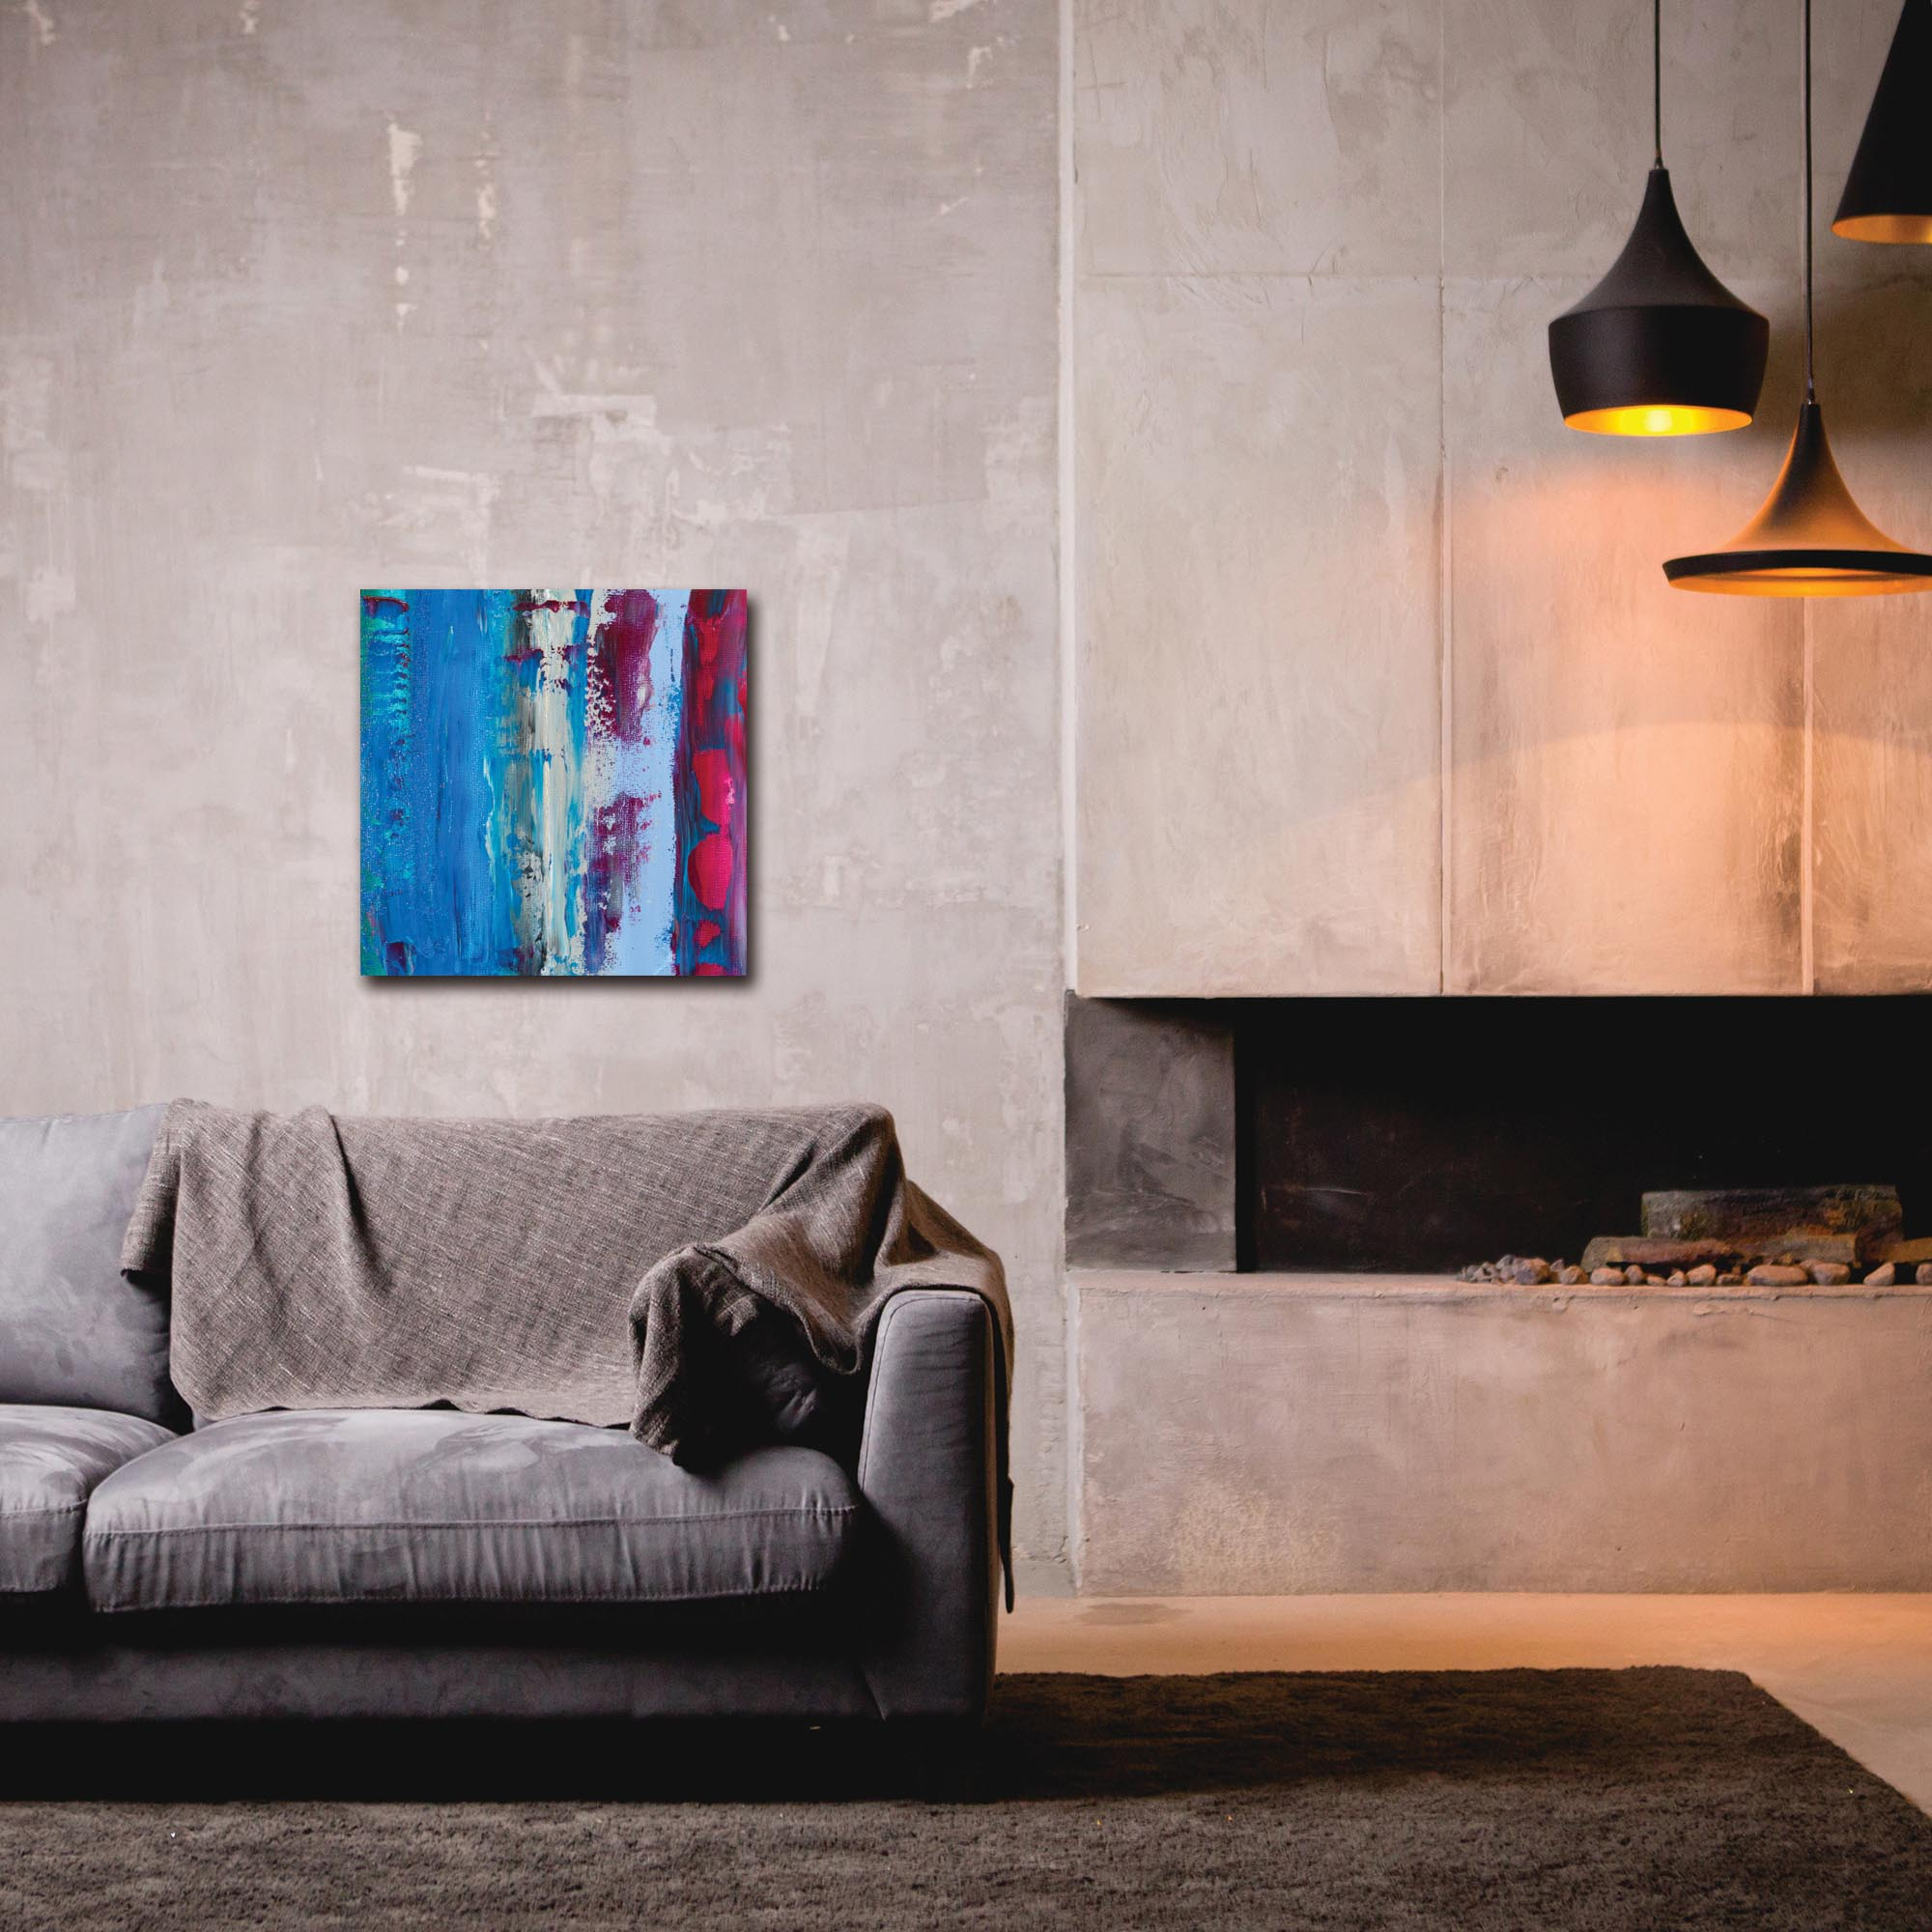 Abstract Wall Art 'Urban Life 9' - Urban Decor on Metal or Plexiglass - Lifestyle View